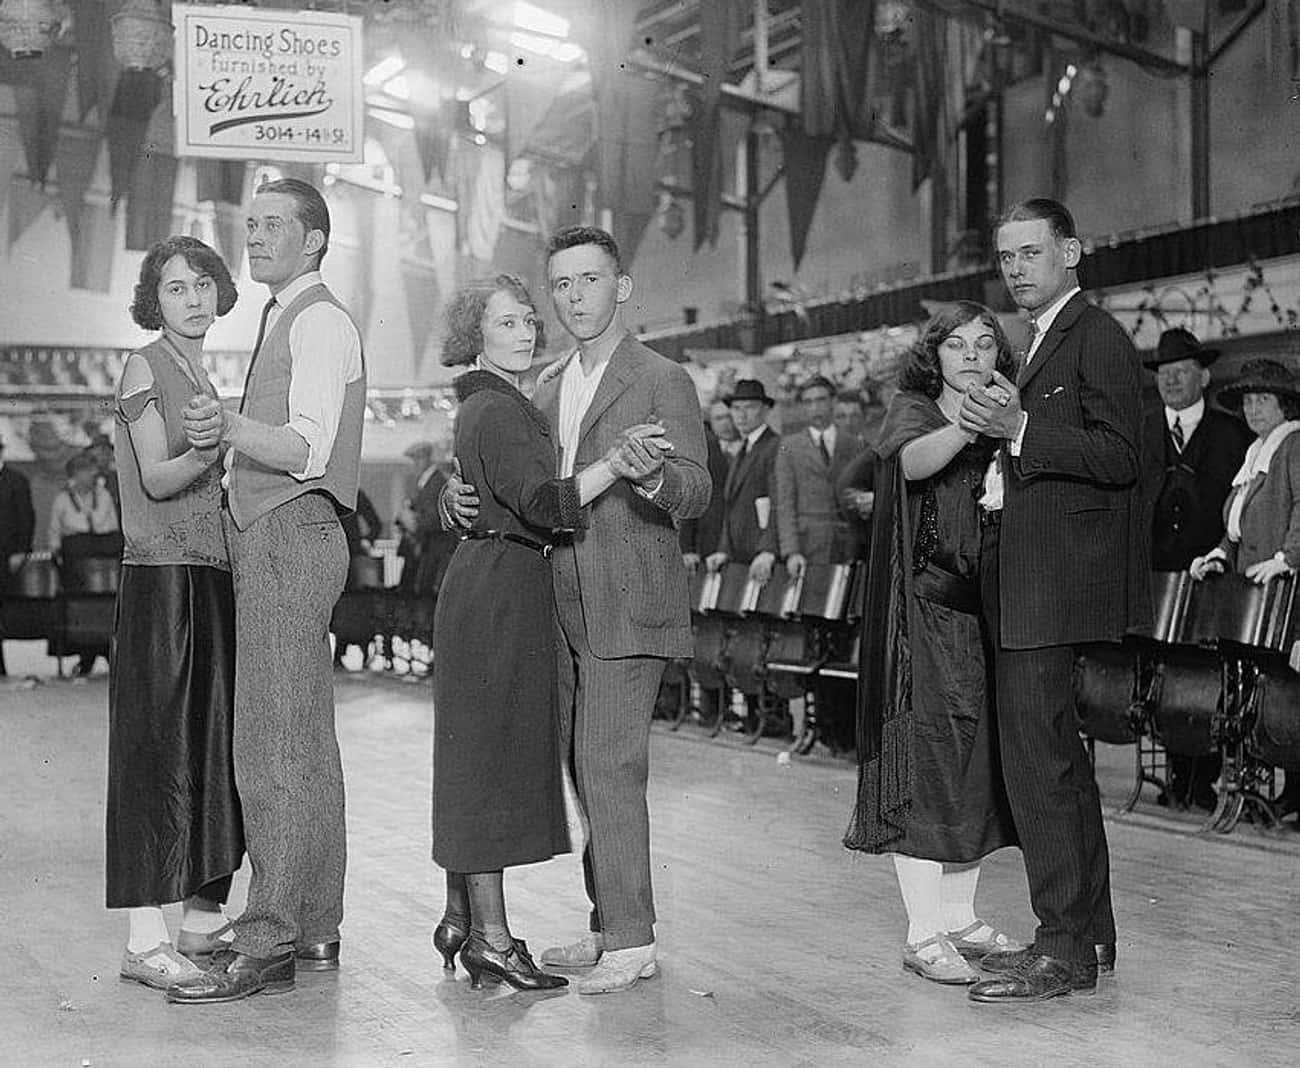 Dance Crazes And Dance Marathons Redefined The Social Scene